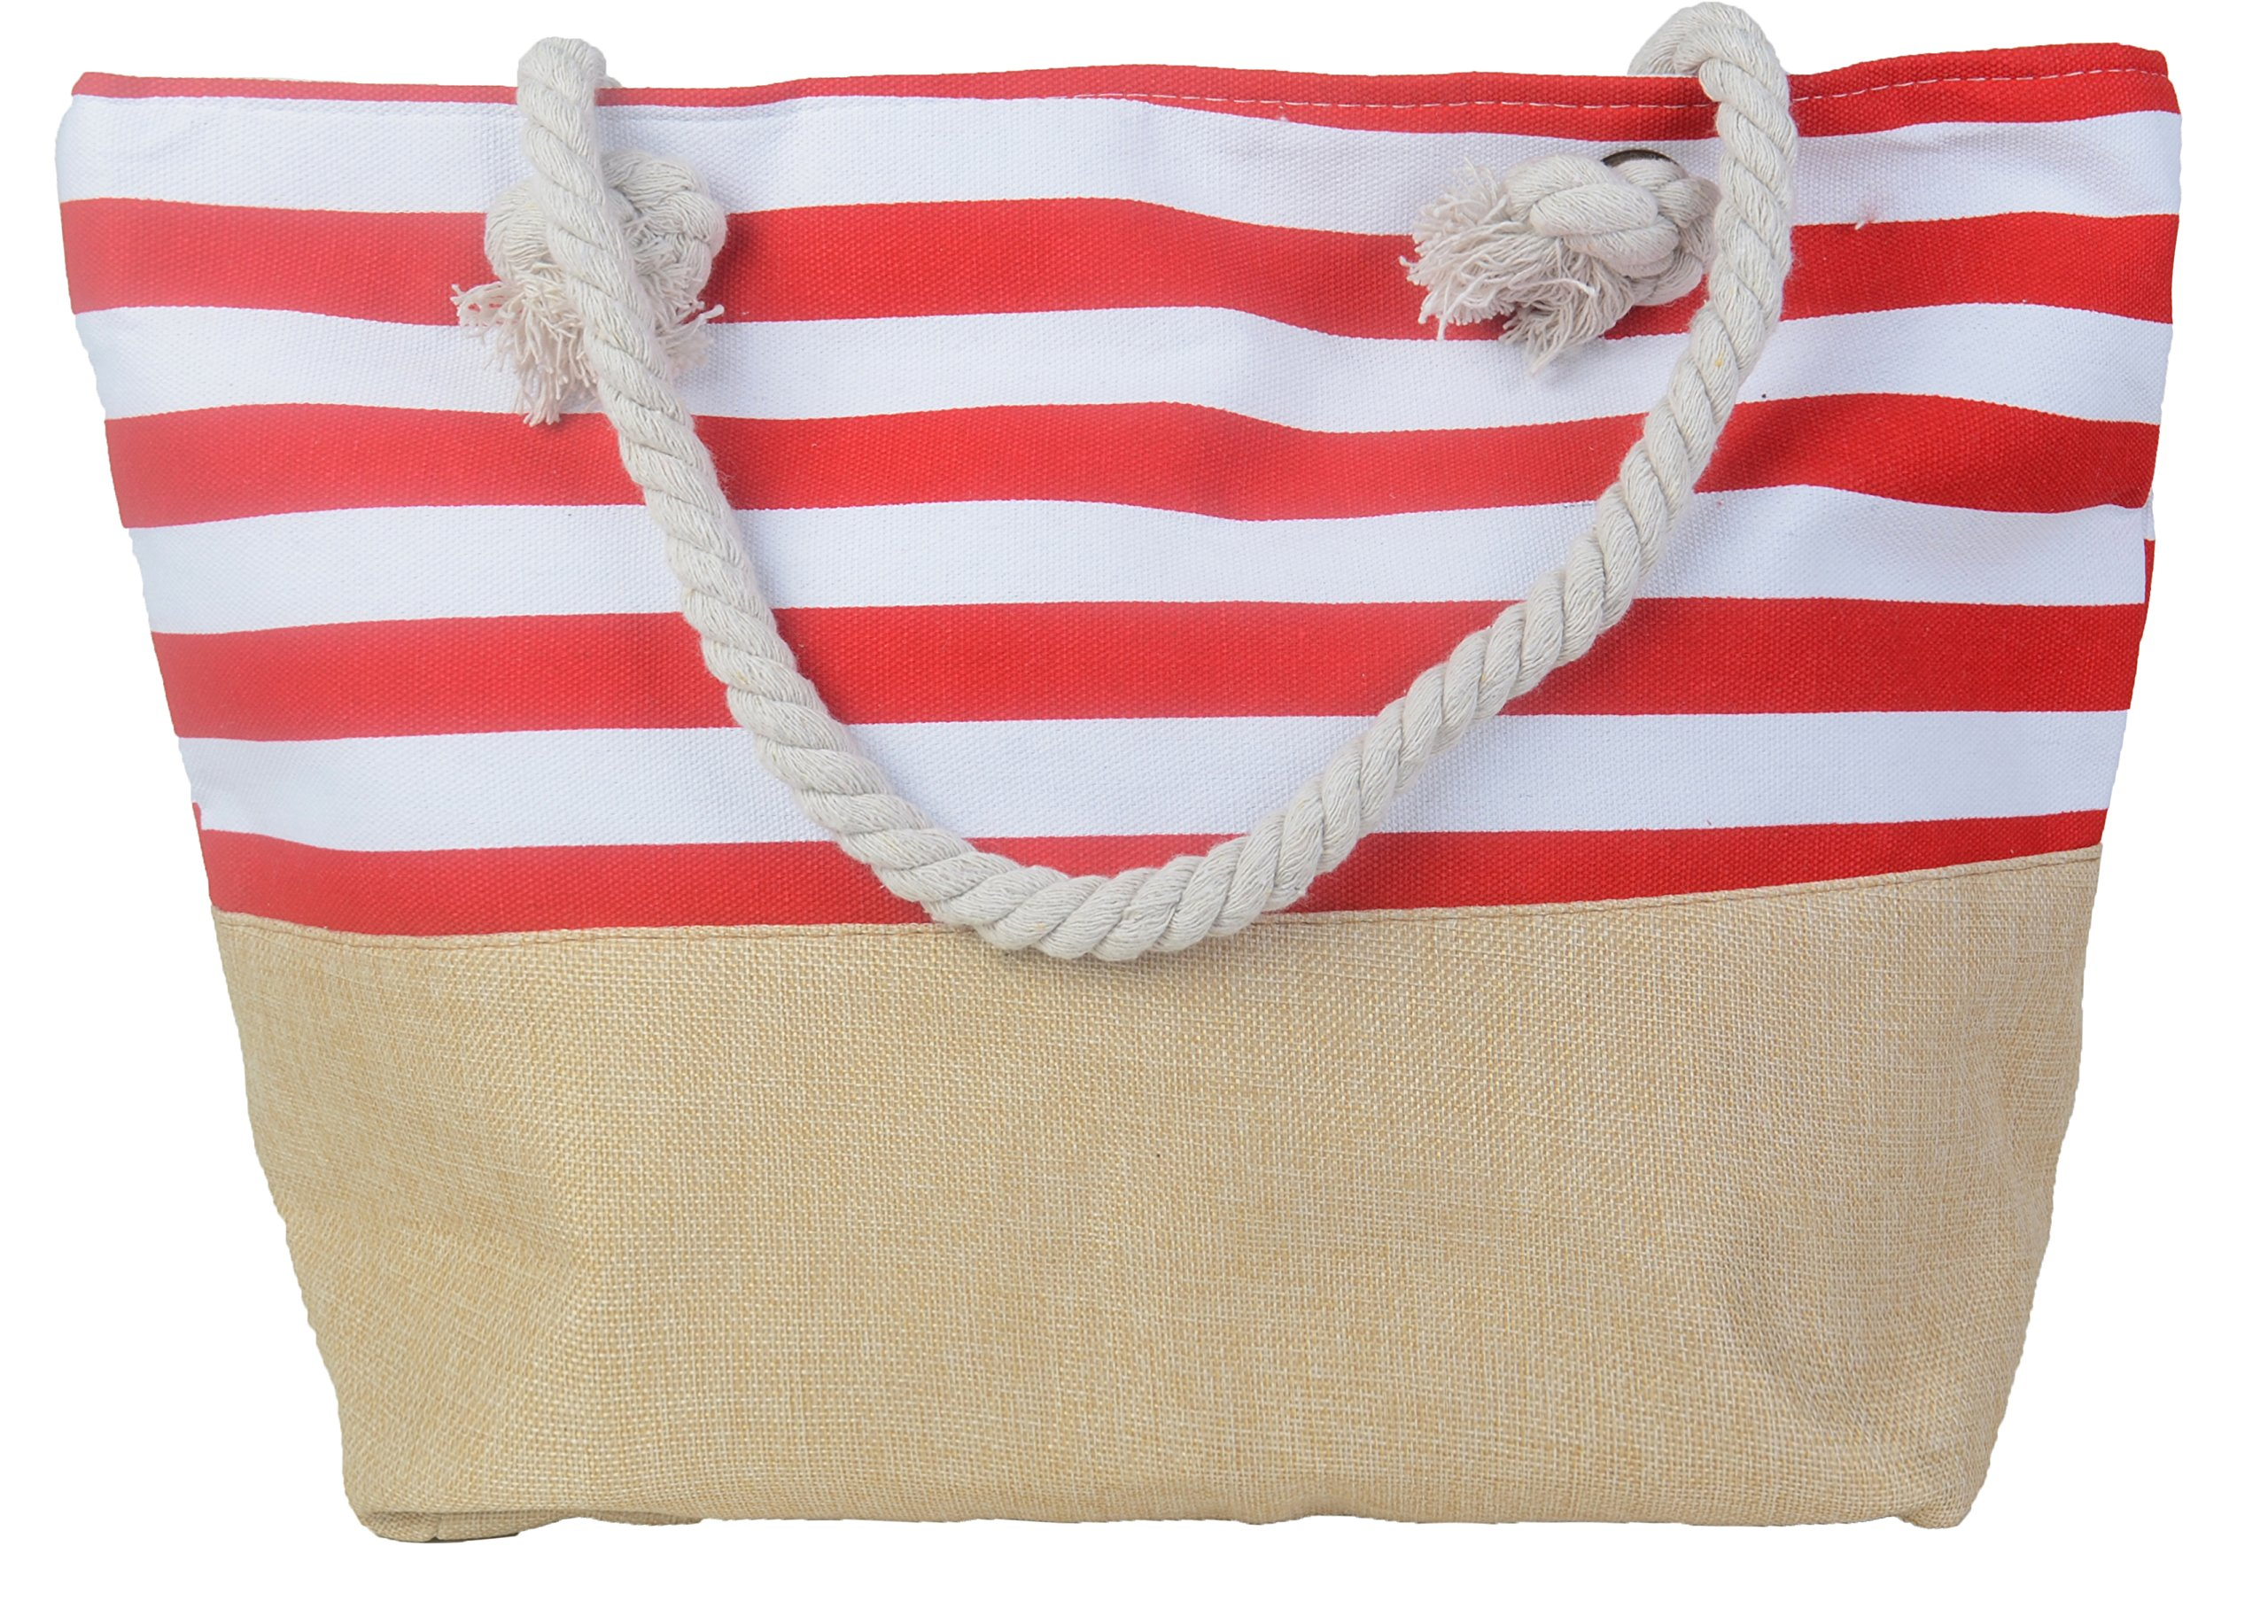 Pulama Womens Large Beach Tote Canvas Shoulder Bag Wave Striped Anchor Summer Handbag Top Handle Bag Straw Beach Bag (RED)